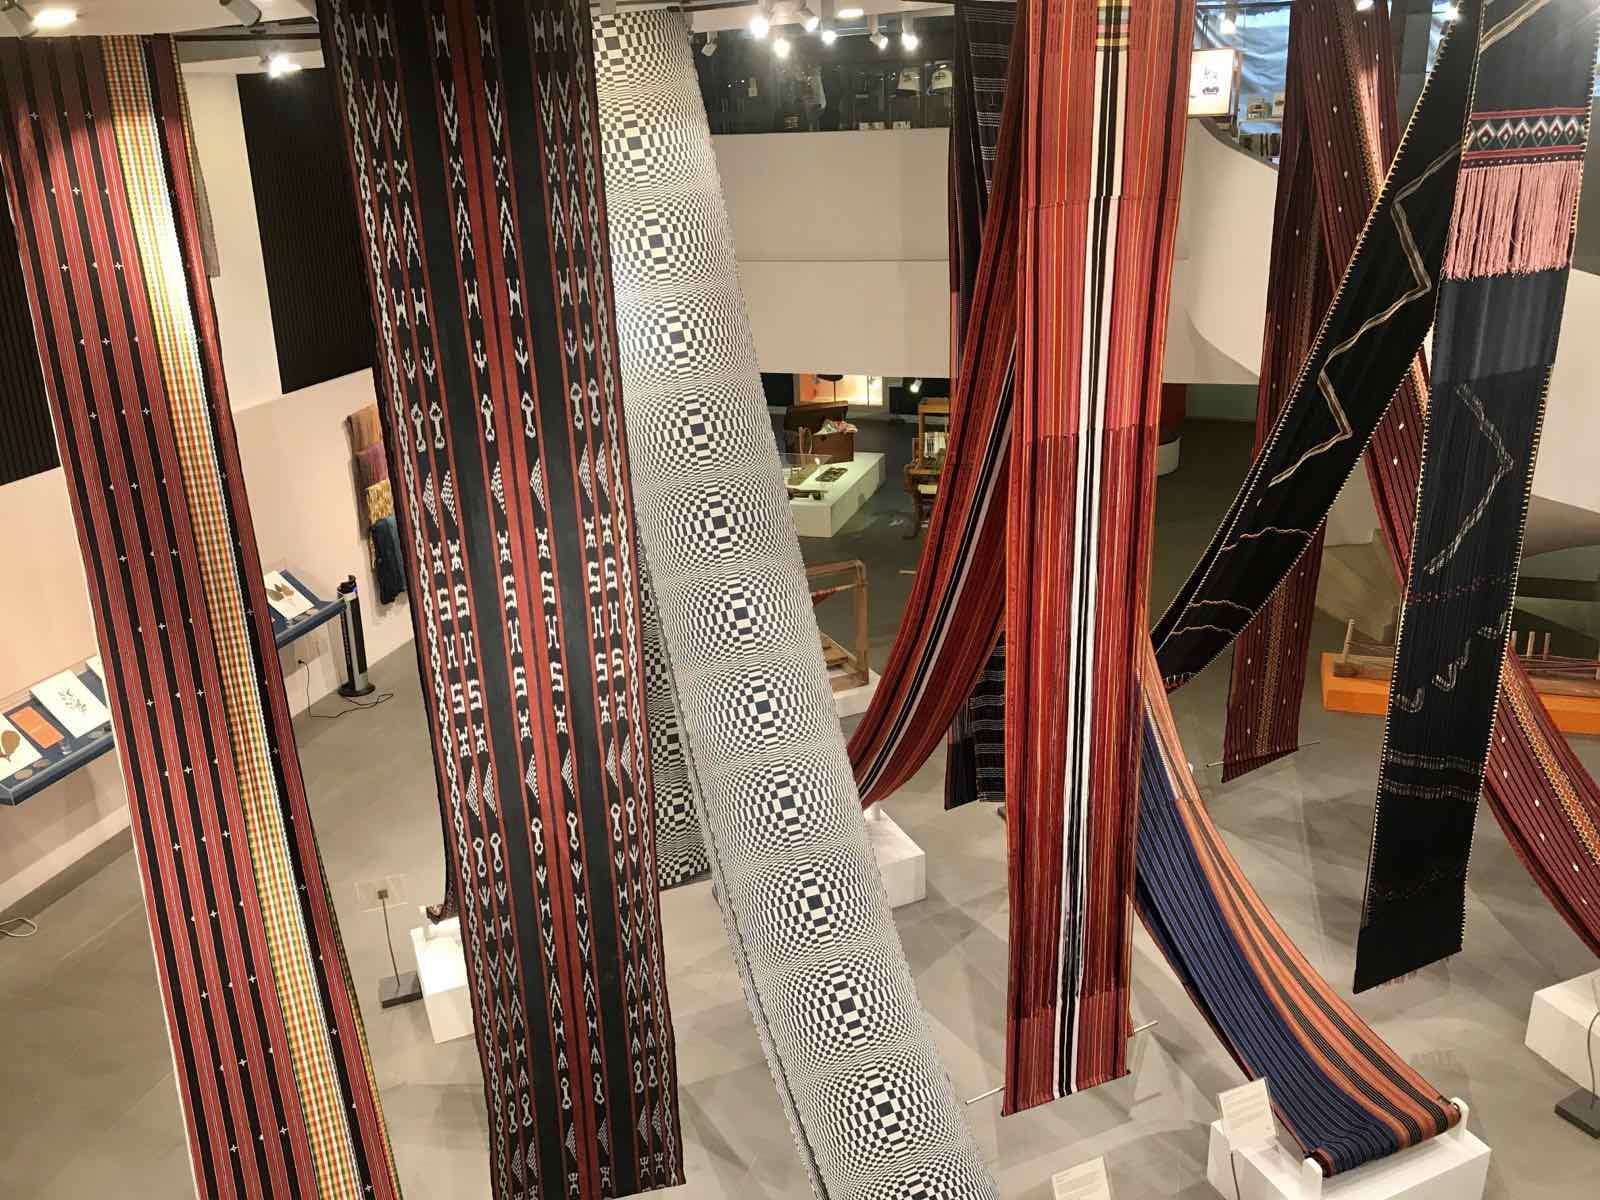 A display of fine weaving at Museo Cordillera